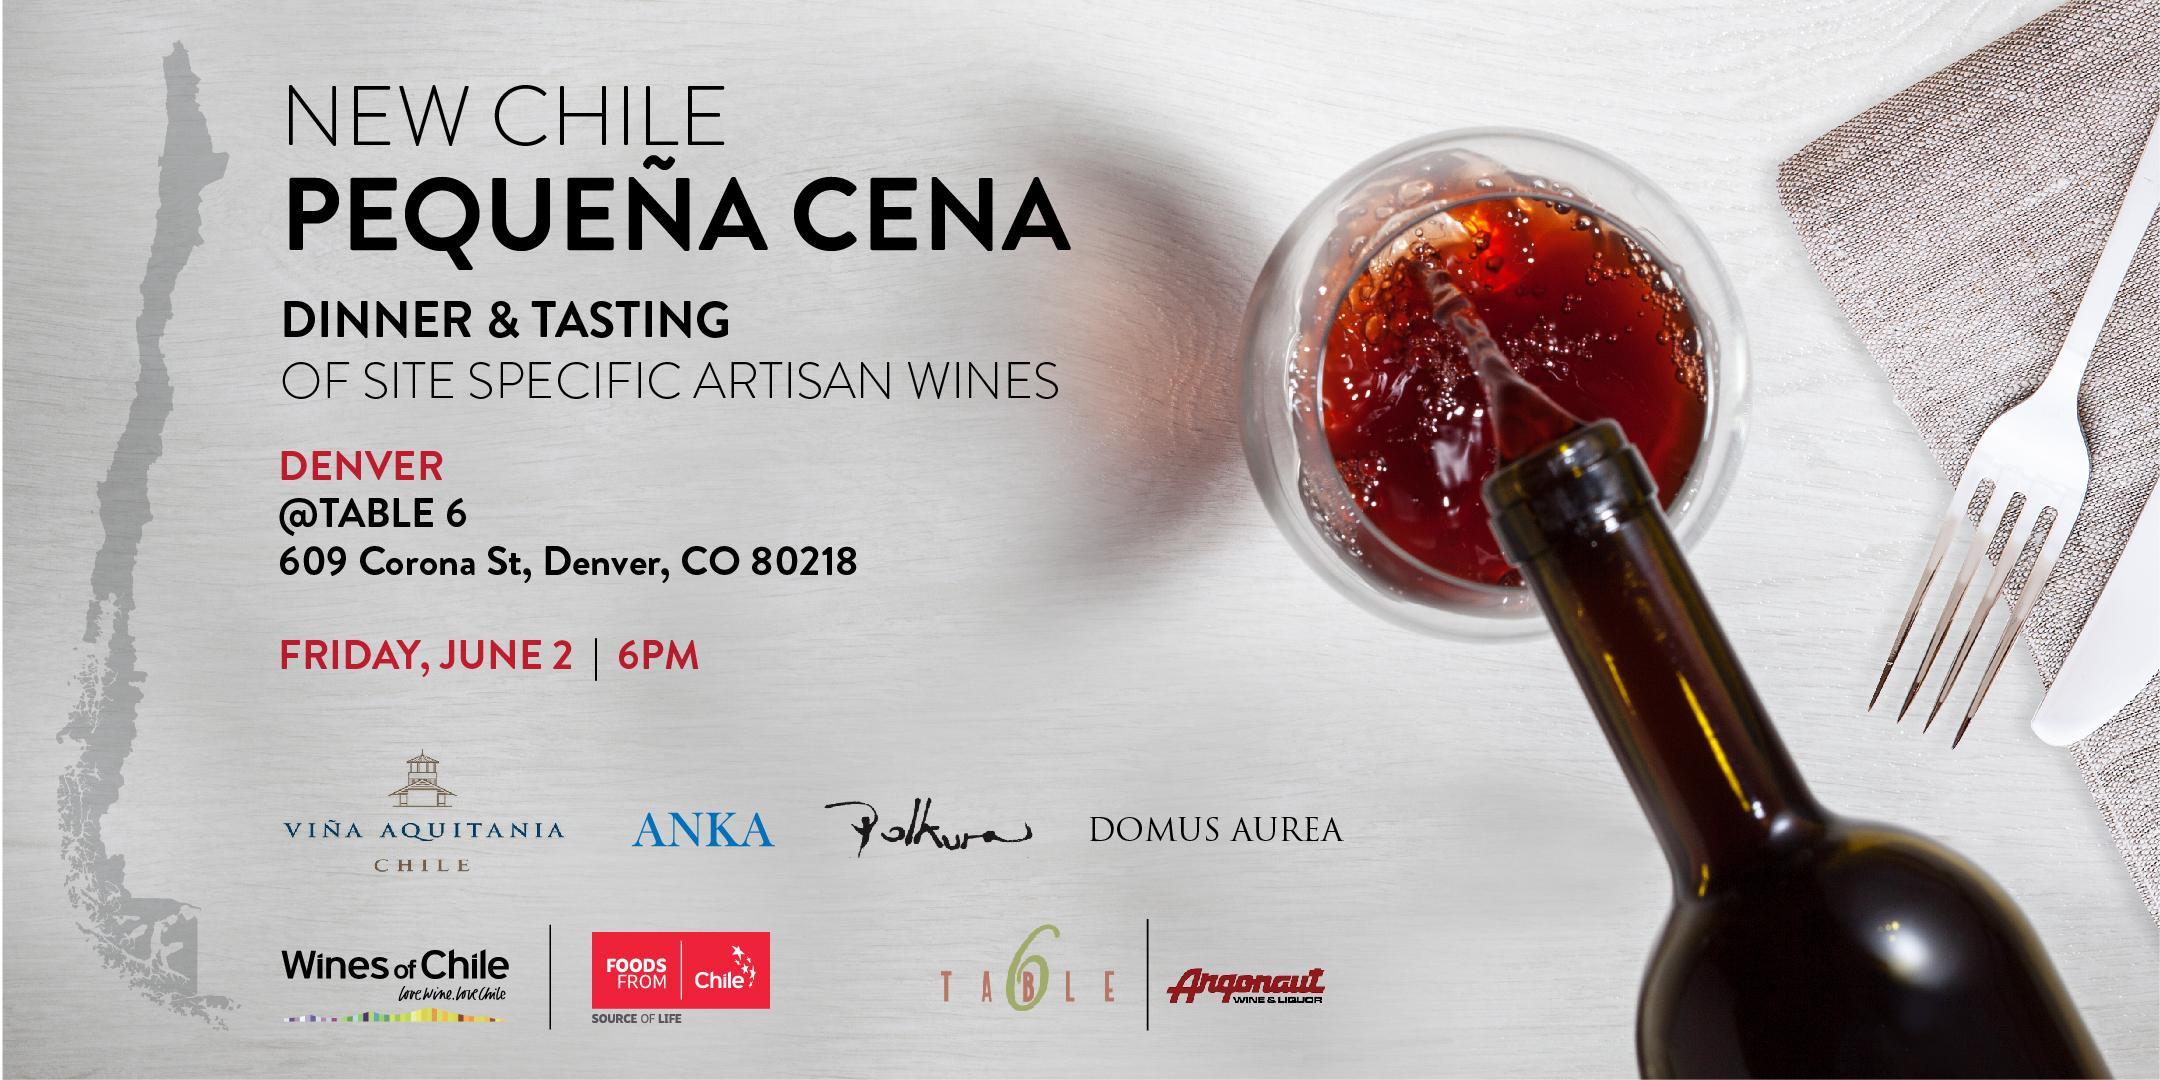 New Chile Pequeña Cena